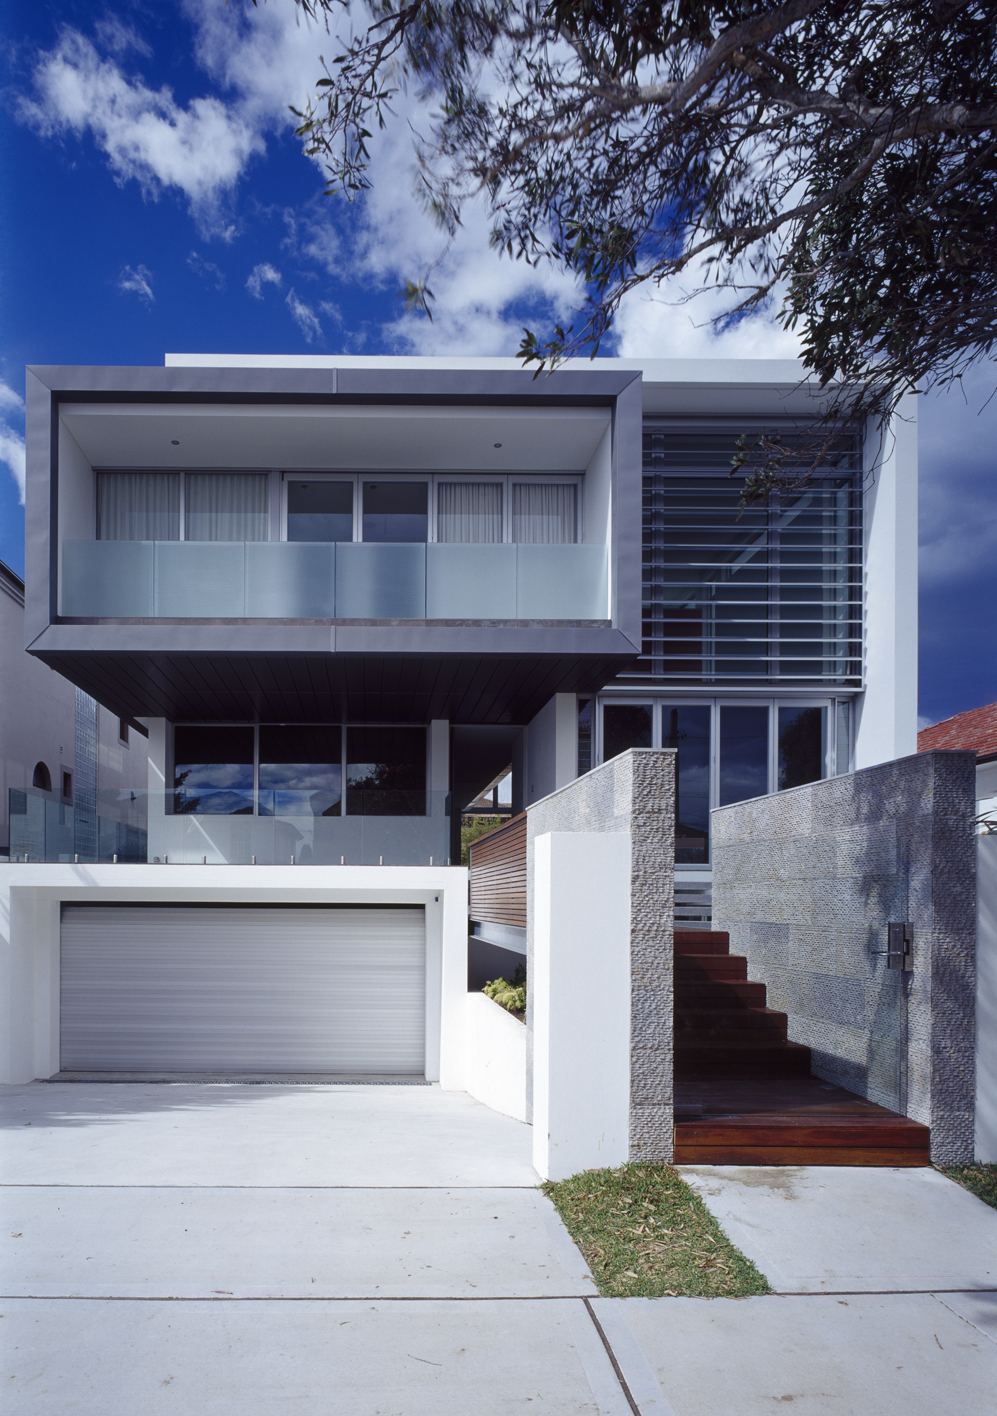 Minosa: Dover Height project wins Corian Design award